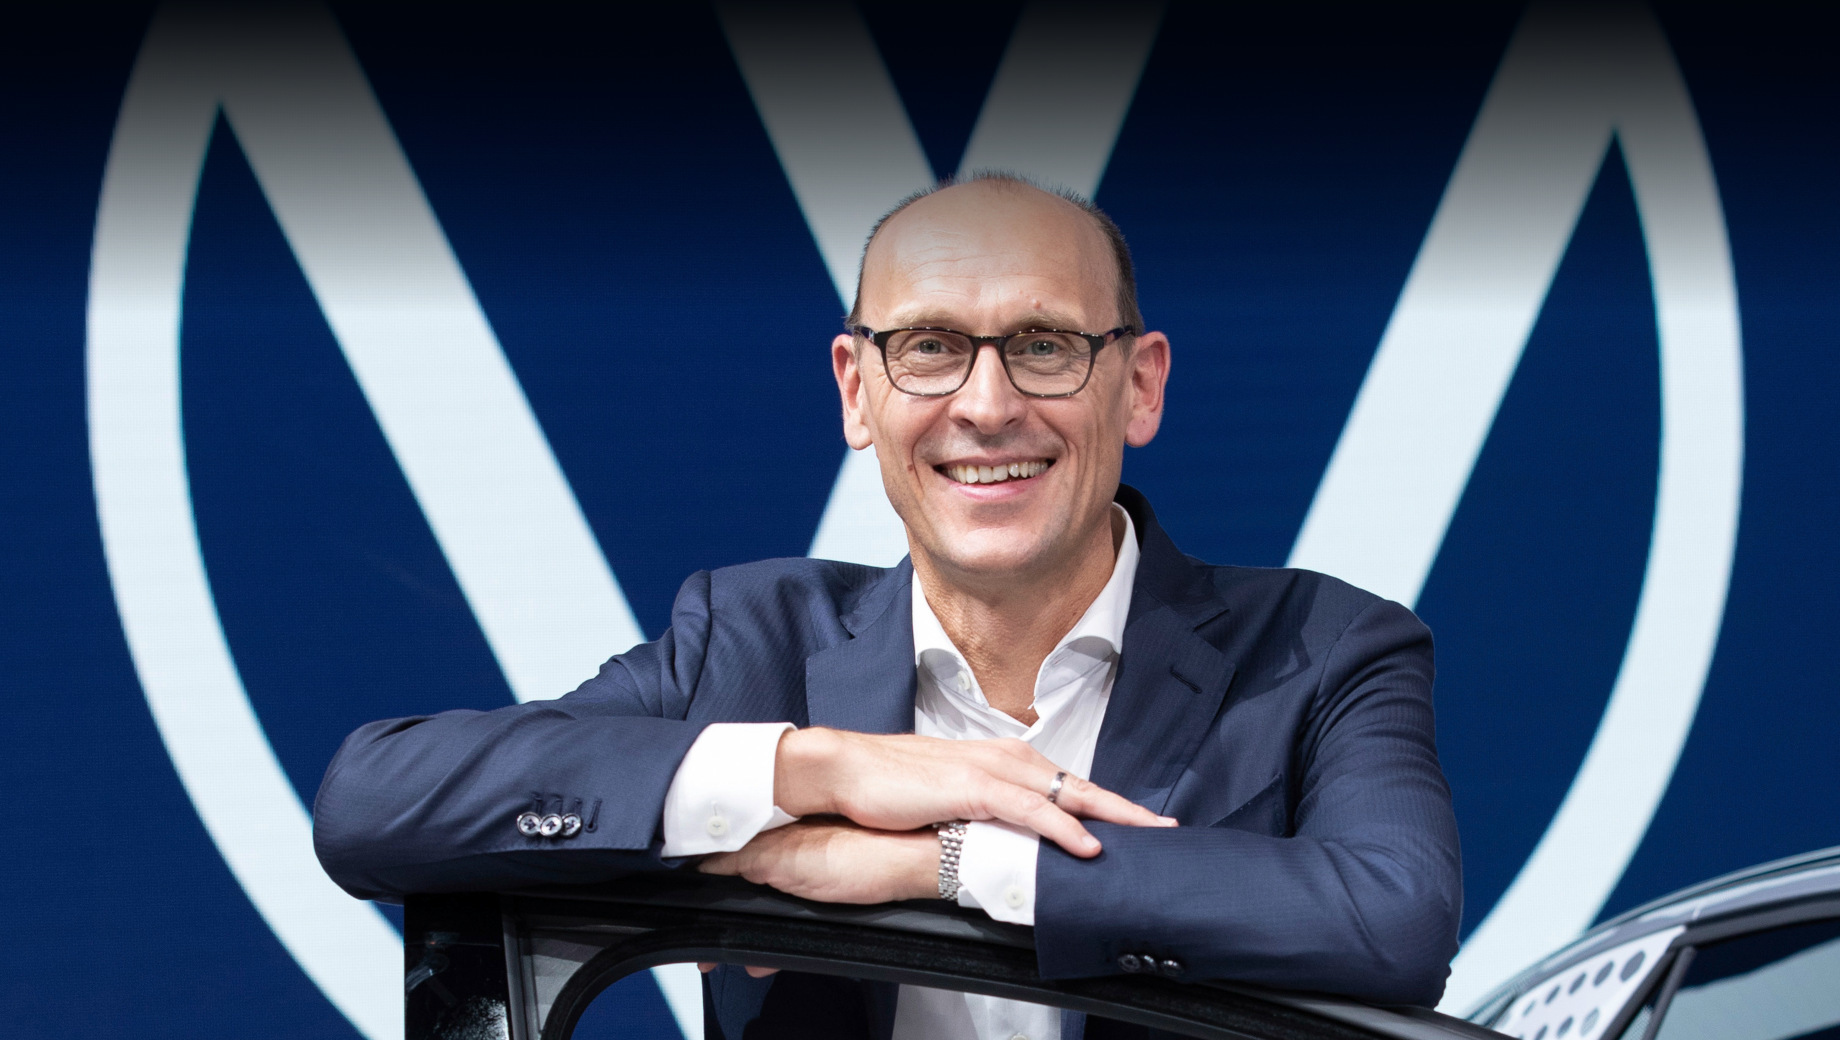 Ральф Брандштеттер возглавит бренд Volkswagen